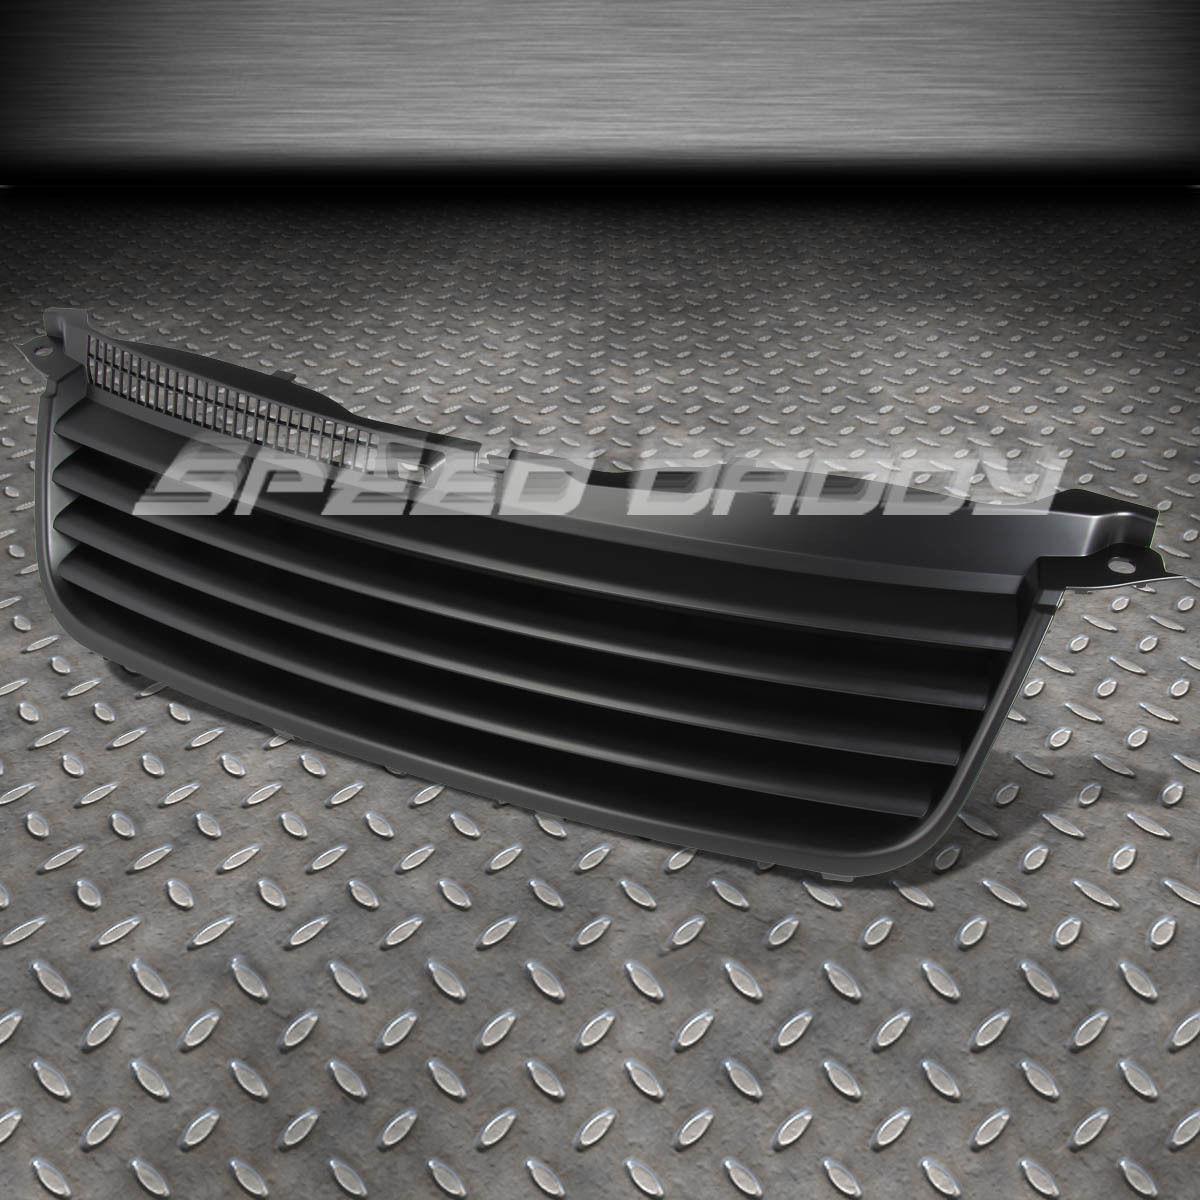 Bmwputer: FOR 02-05 VW PASSAT B5.5 BLACK PLASTIC FRONT HOOD SPORT